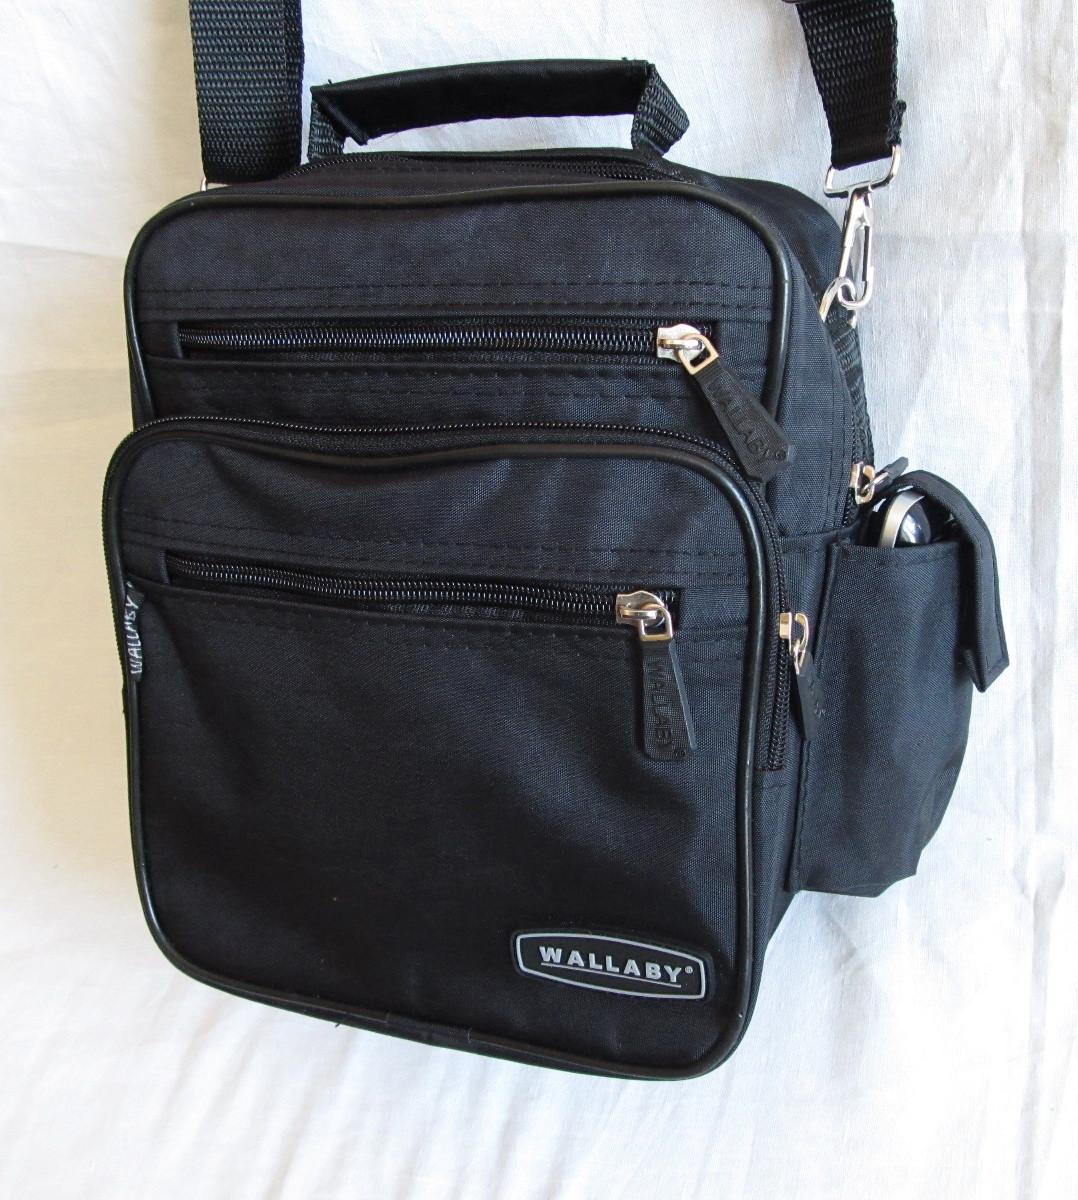 b8e78ea4e27d Мужская сумка Wallaby2665 черная барсетка через плечо 20х25х16см -  Интернет-магазин